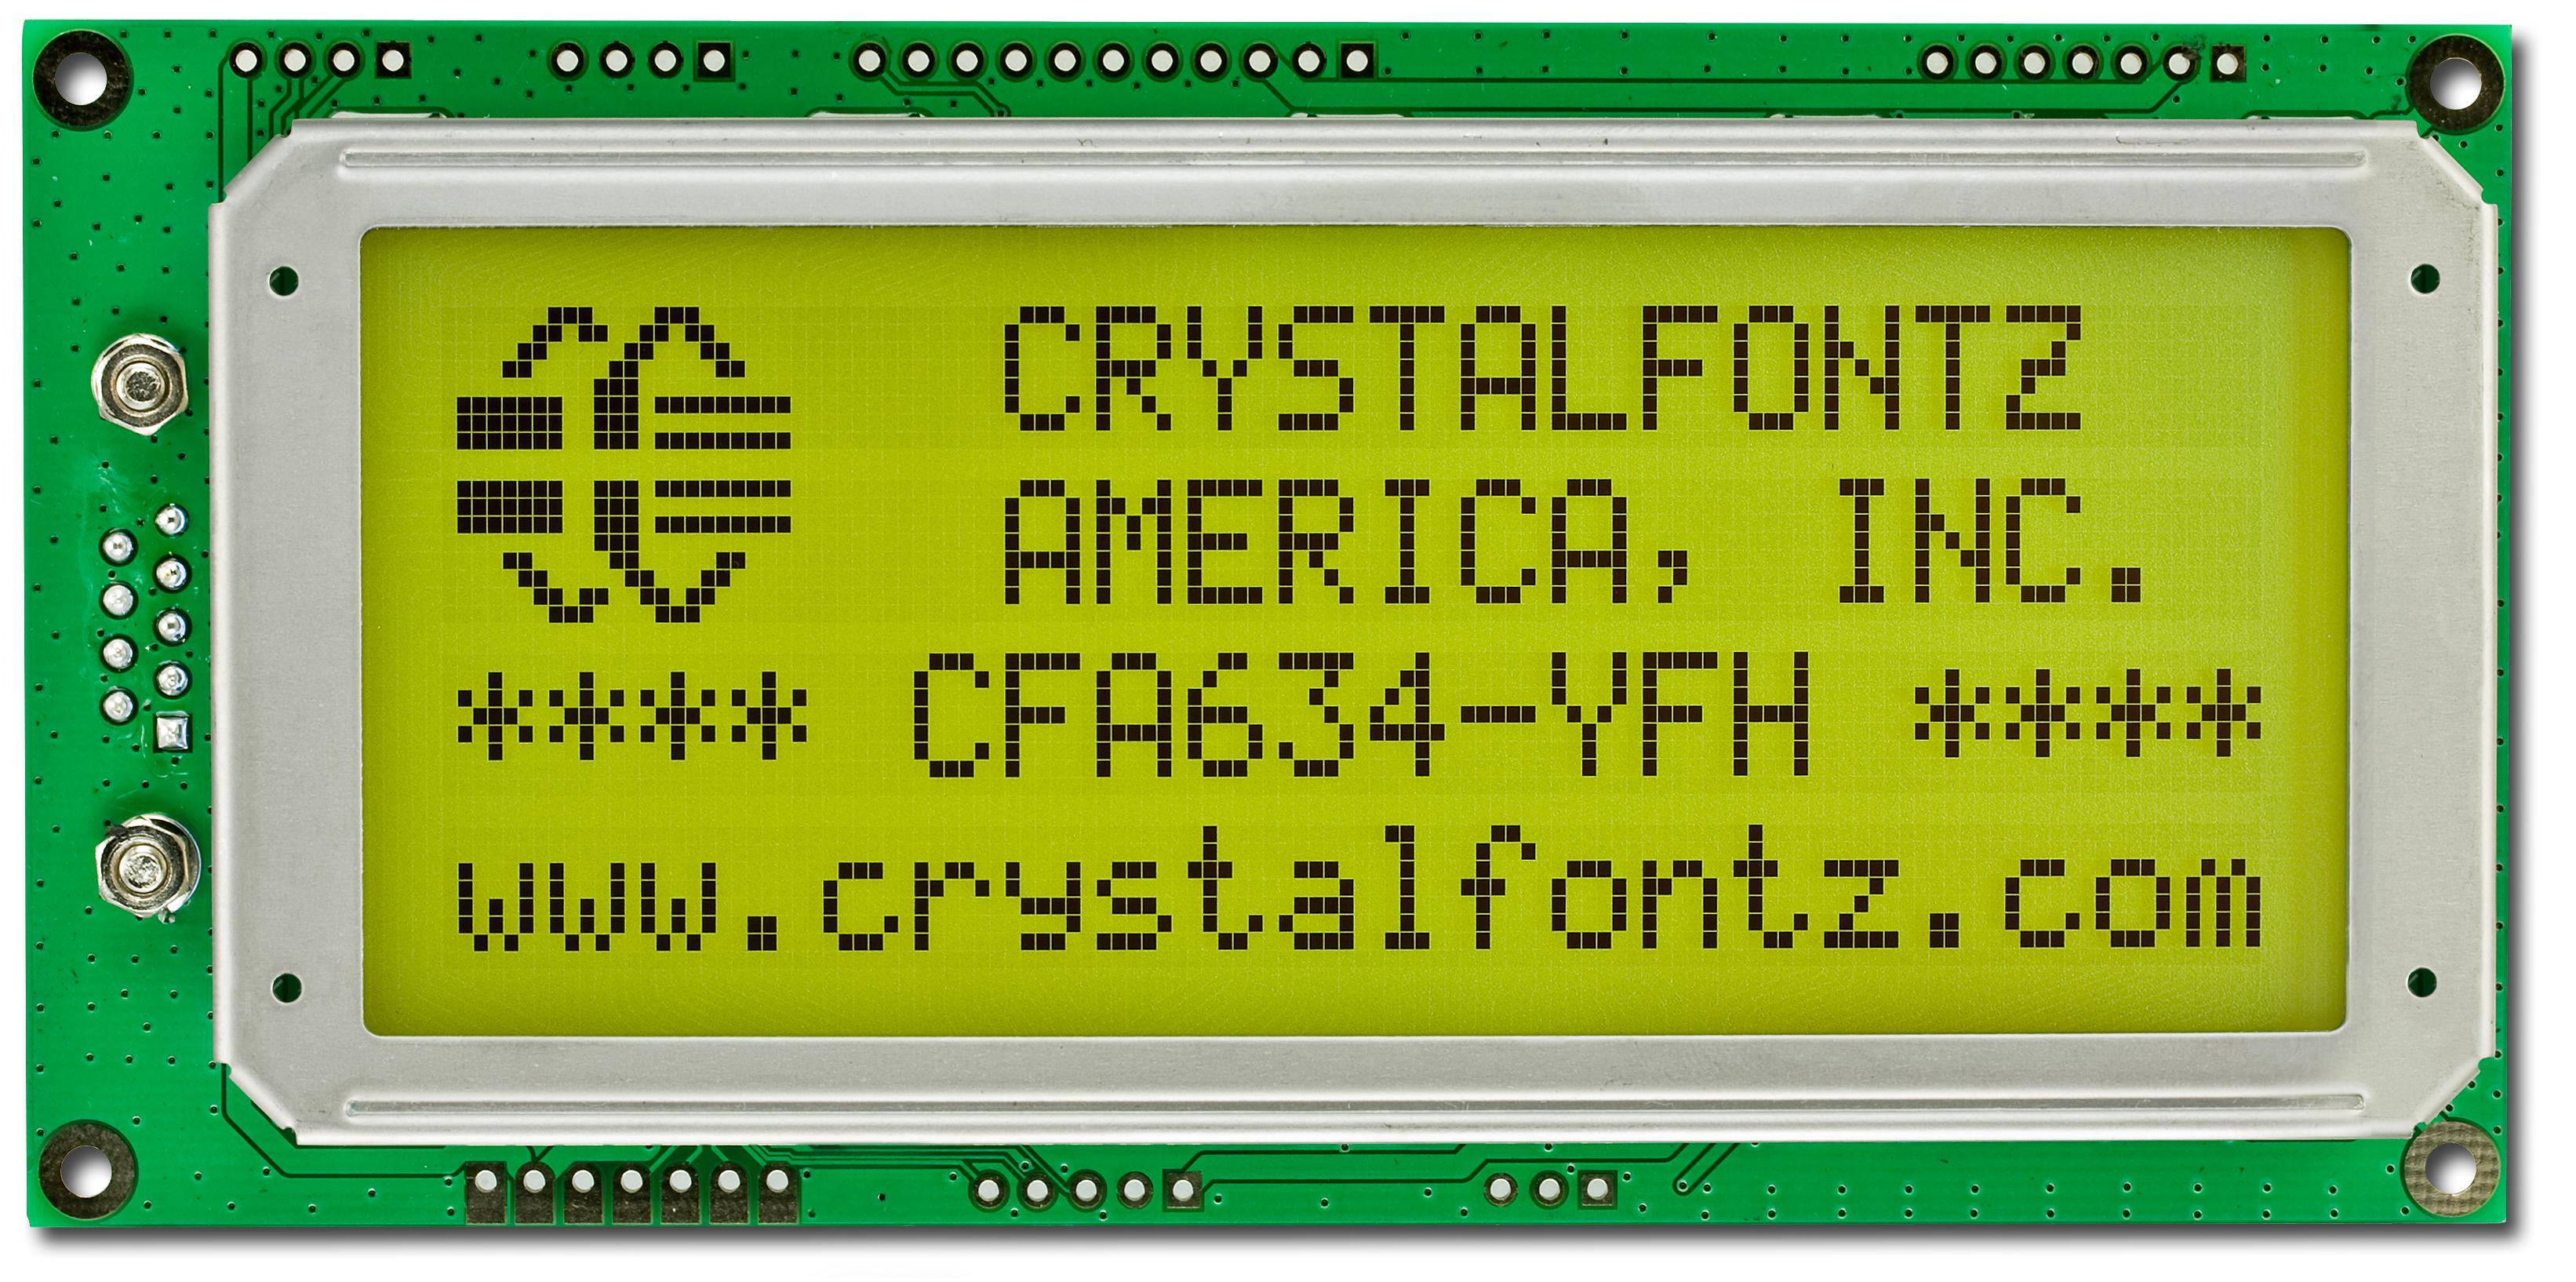 20x4 Character Display LCD